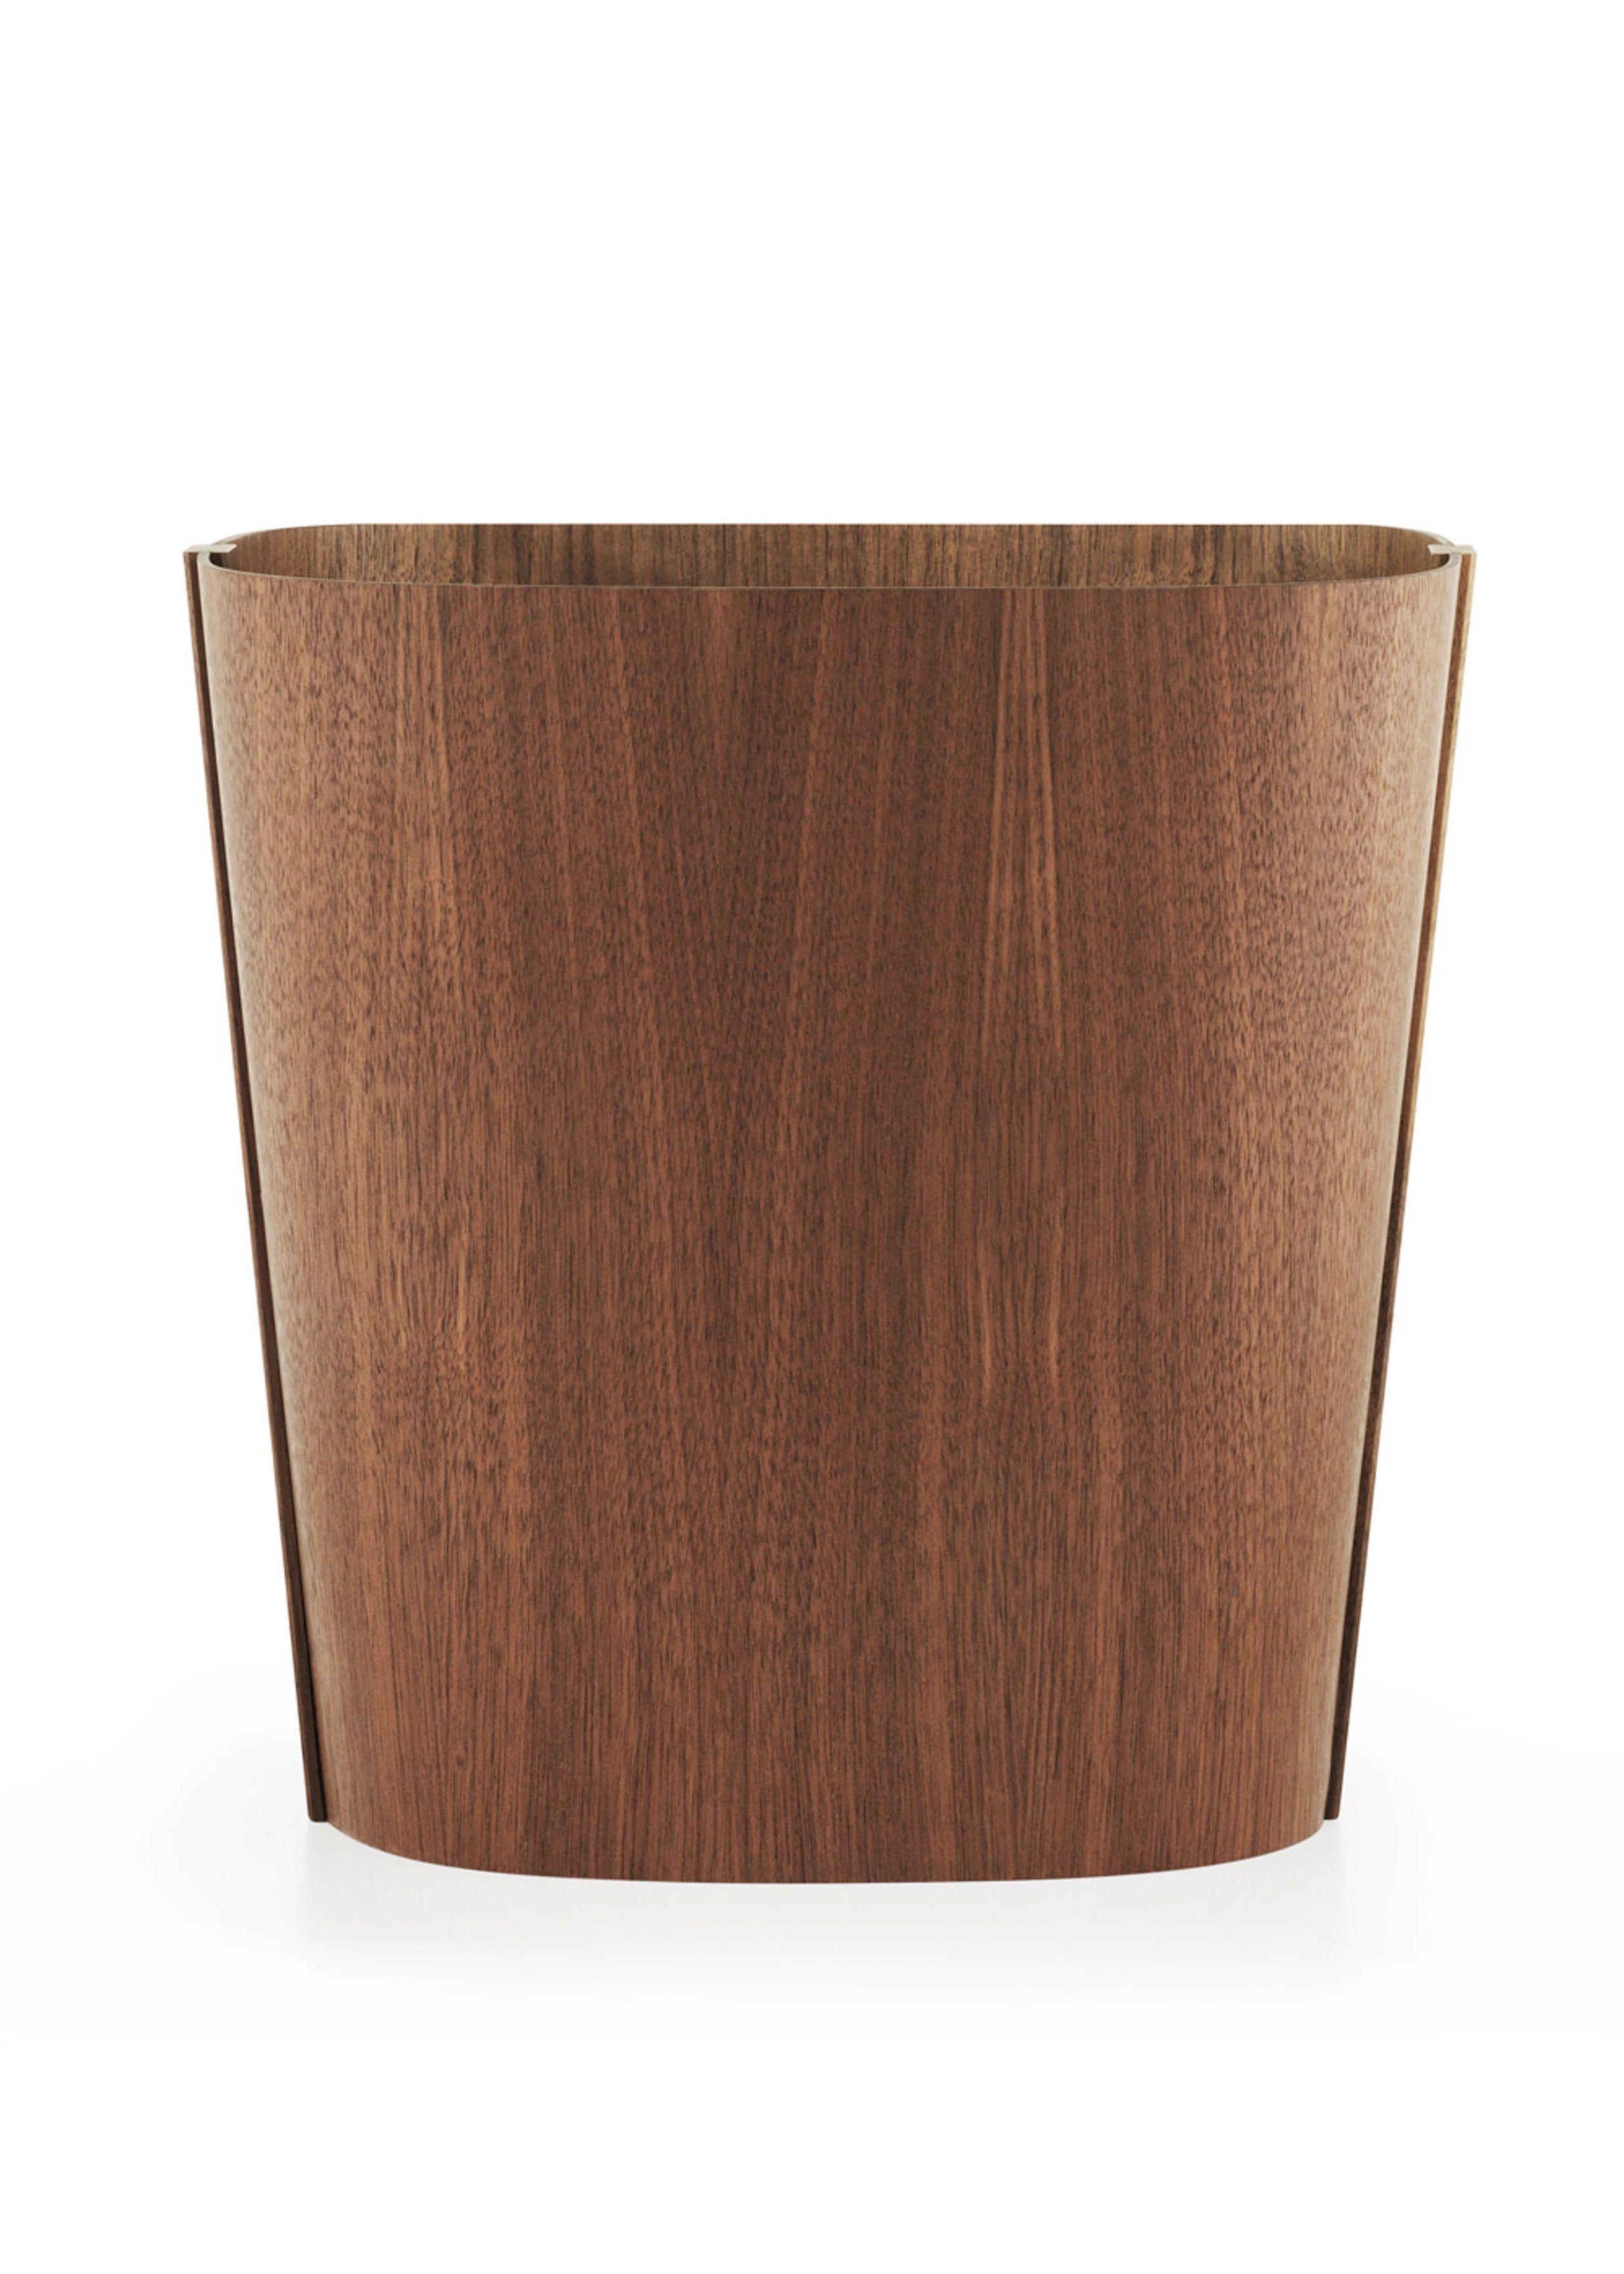 Image of   Tales of Wood Office Bin